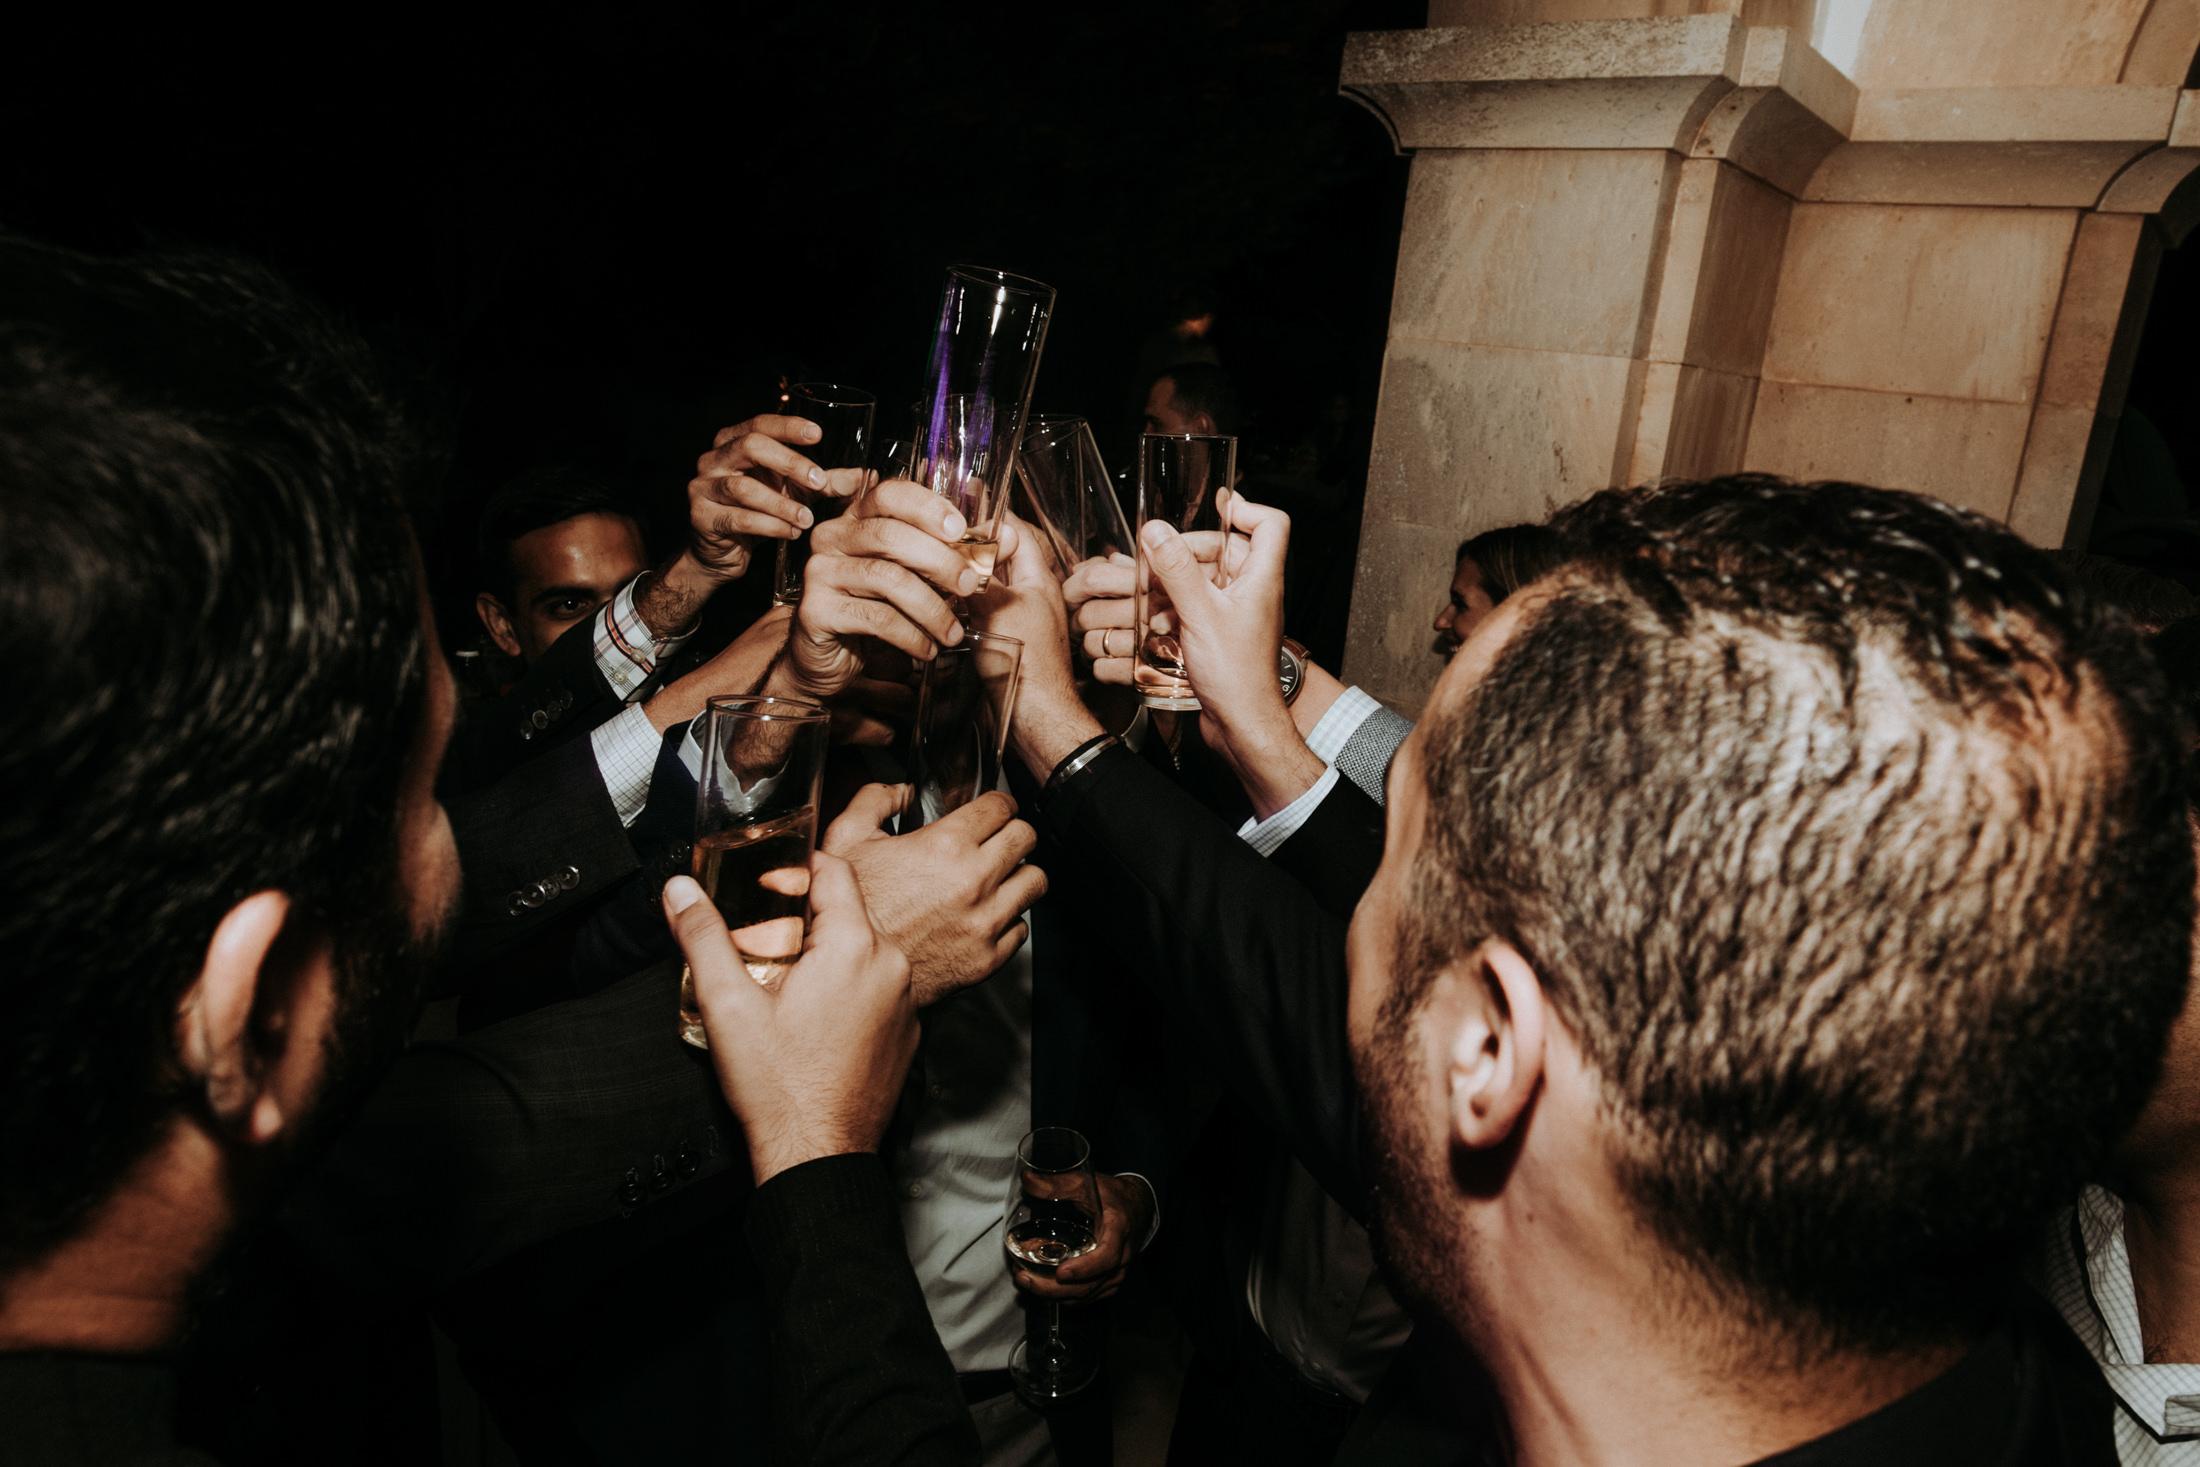 Wedding_Photographer_Mallorca_Daniela-Marquardt_Photography_New_York_Iceland_Tuscany_Santorini_Portugal_Austria_Bavaria_Elopement_Hochzeitsfotograf_AntjeRajat1_62